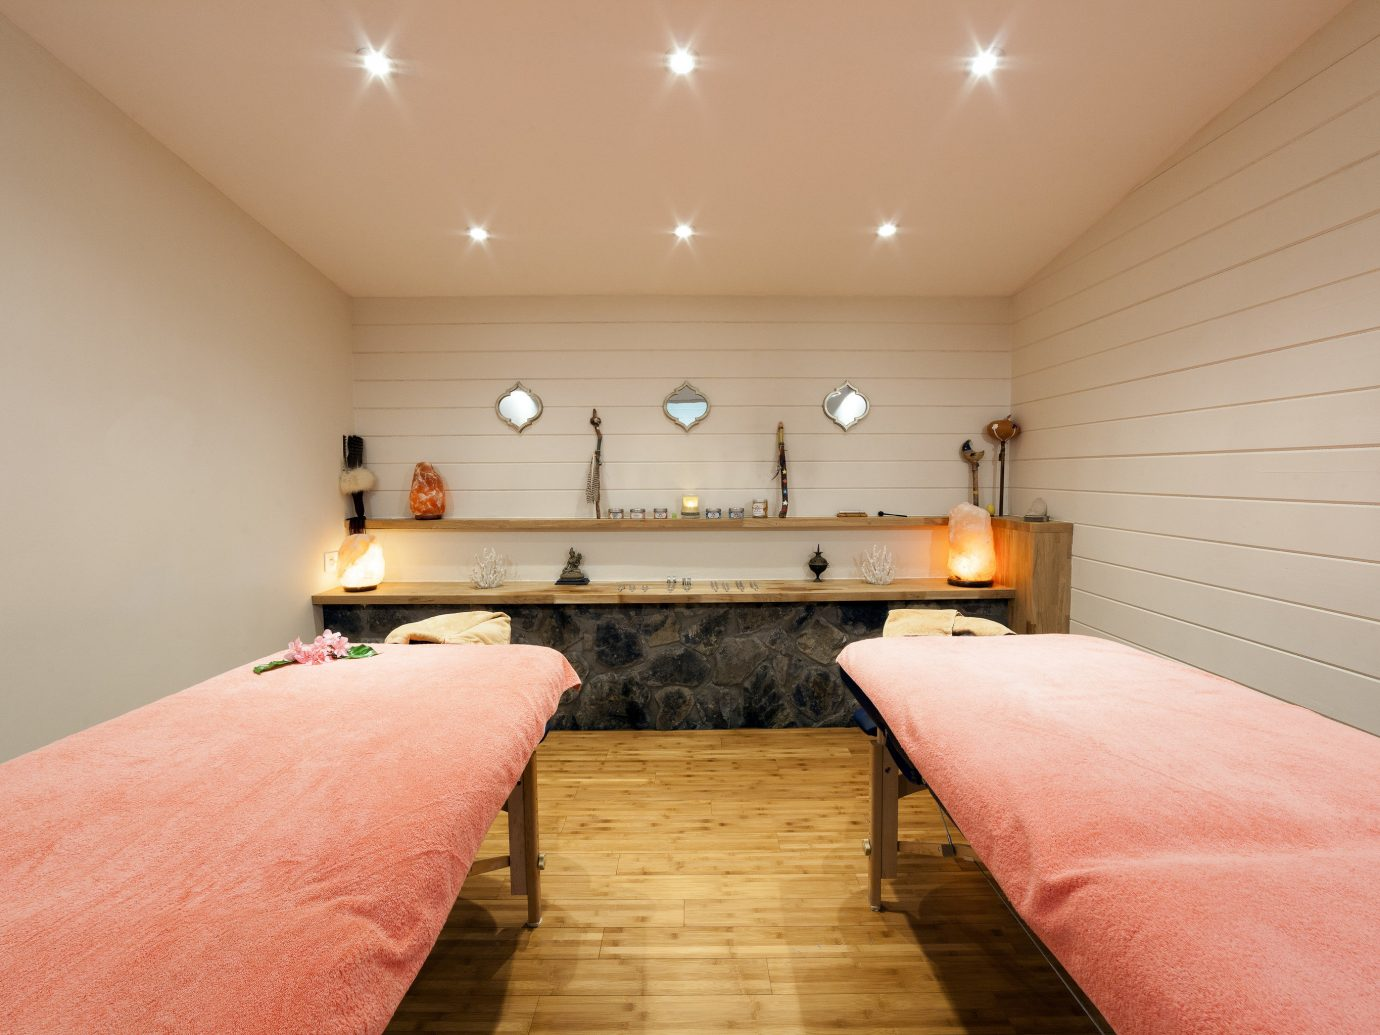 Hotels indoor wall bed ceiling floor Bedroom room interior design real estate home furniture wood flooring house daylighting Suite table estate